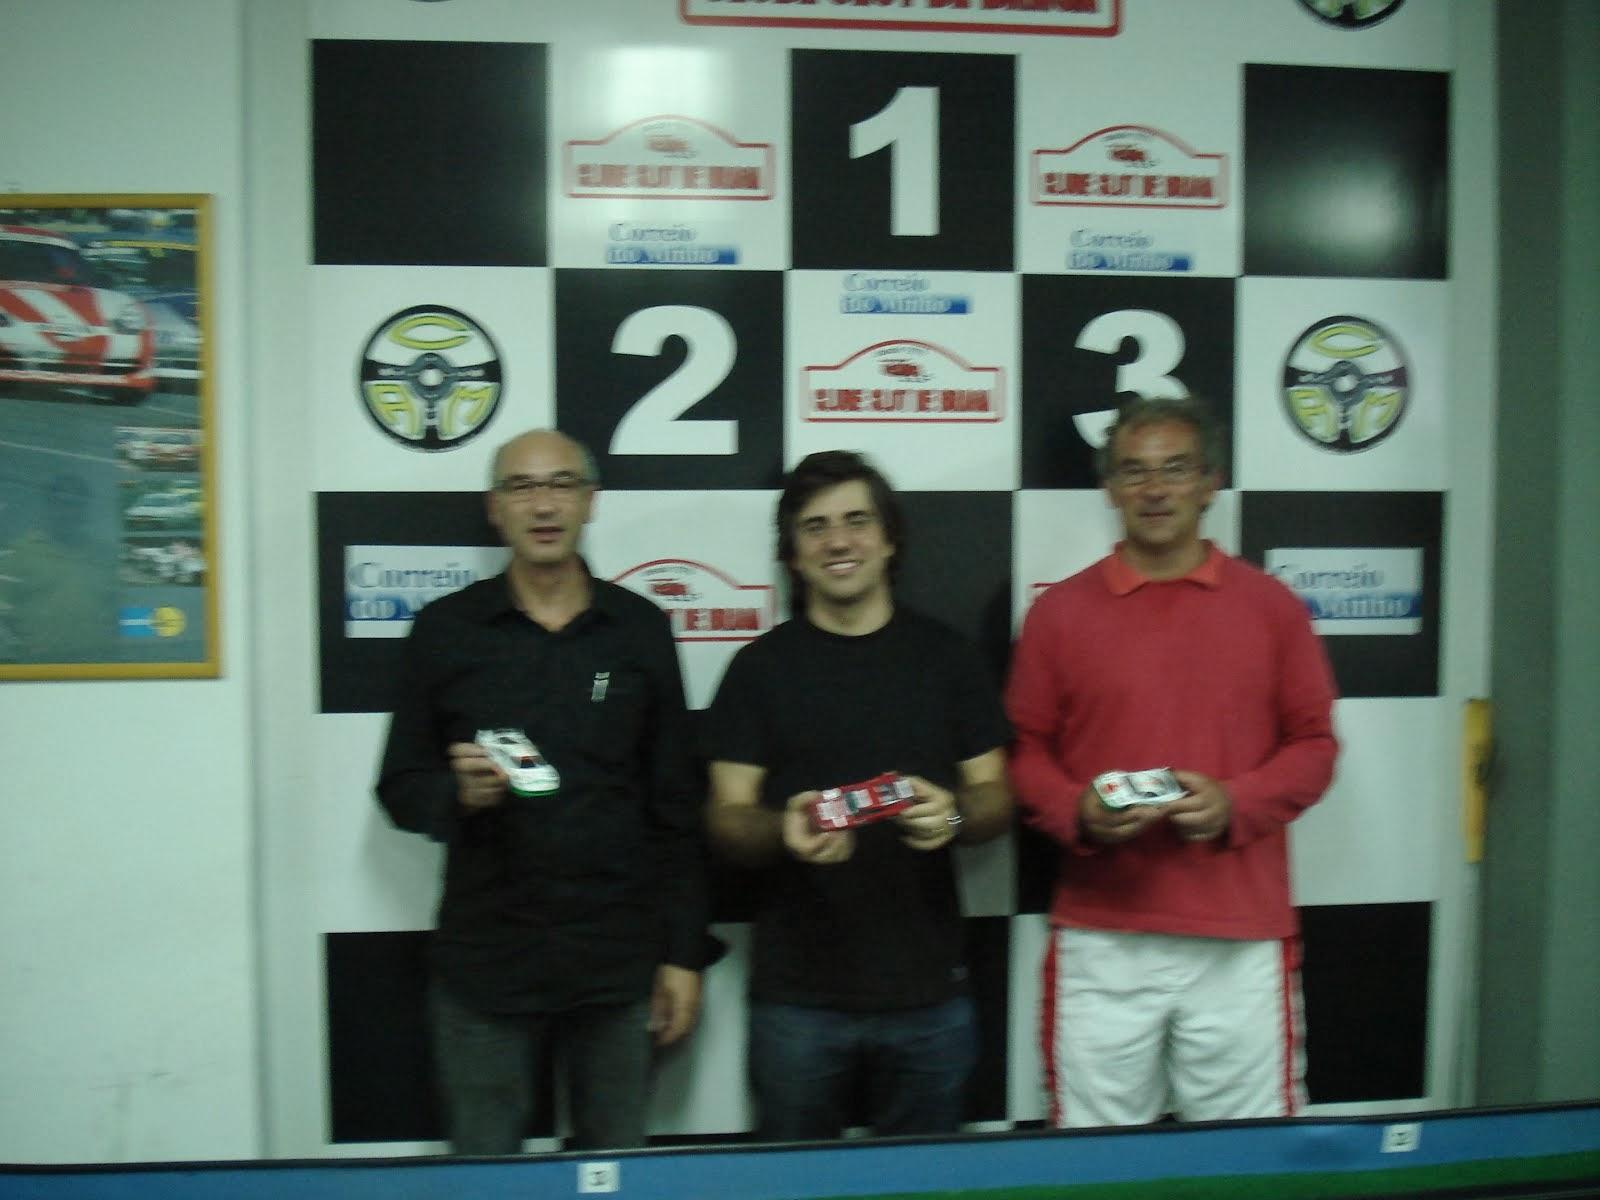 Campeonato GT 2013